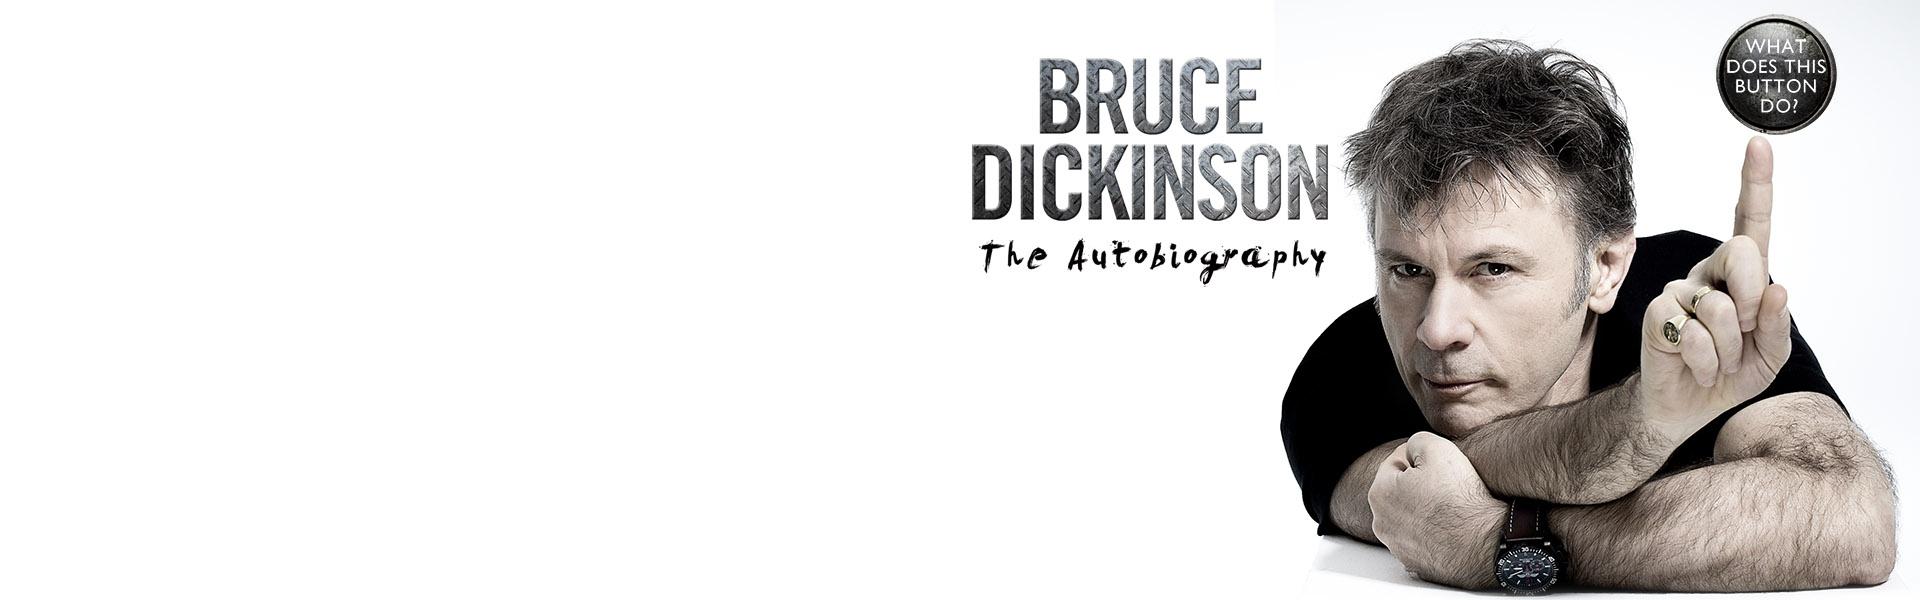 Bruce's Book Tour 2018